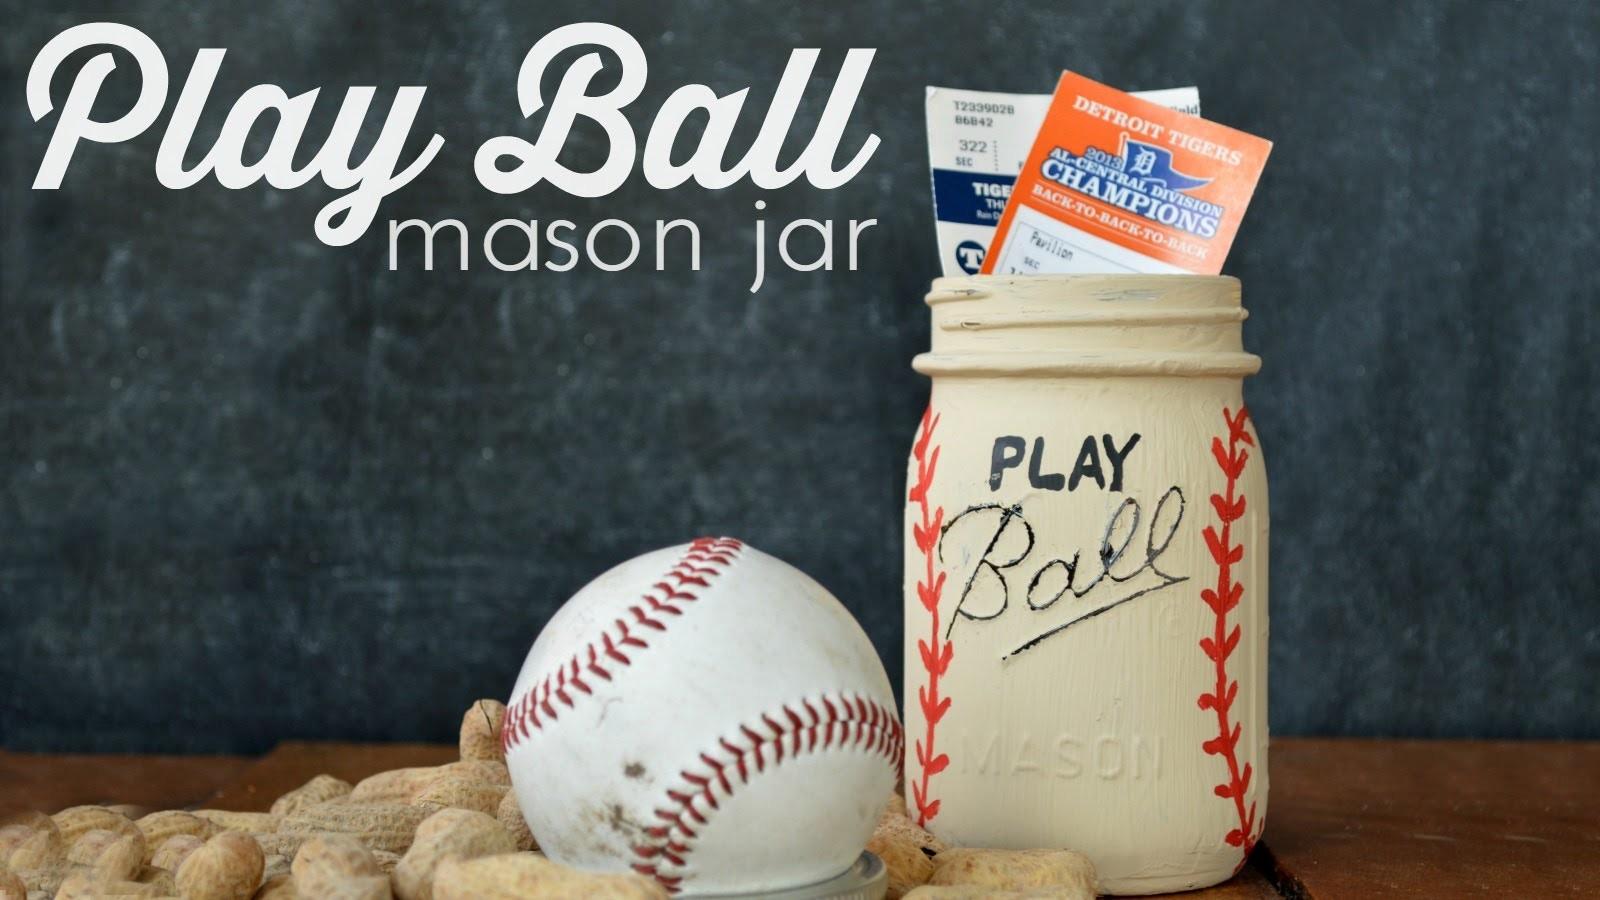 How to Make a Play Ball Mason Jar